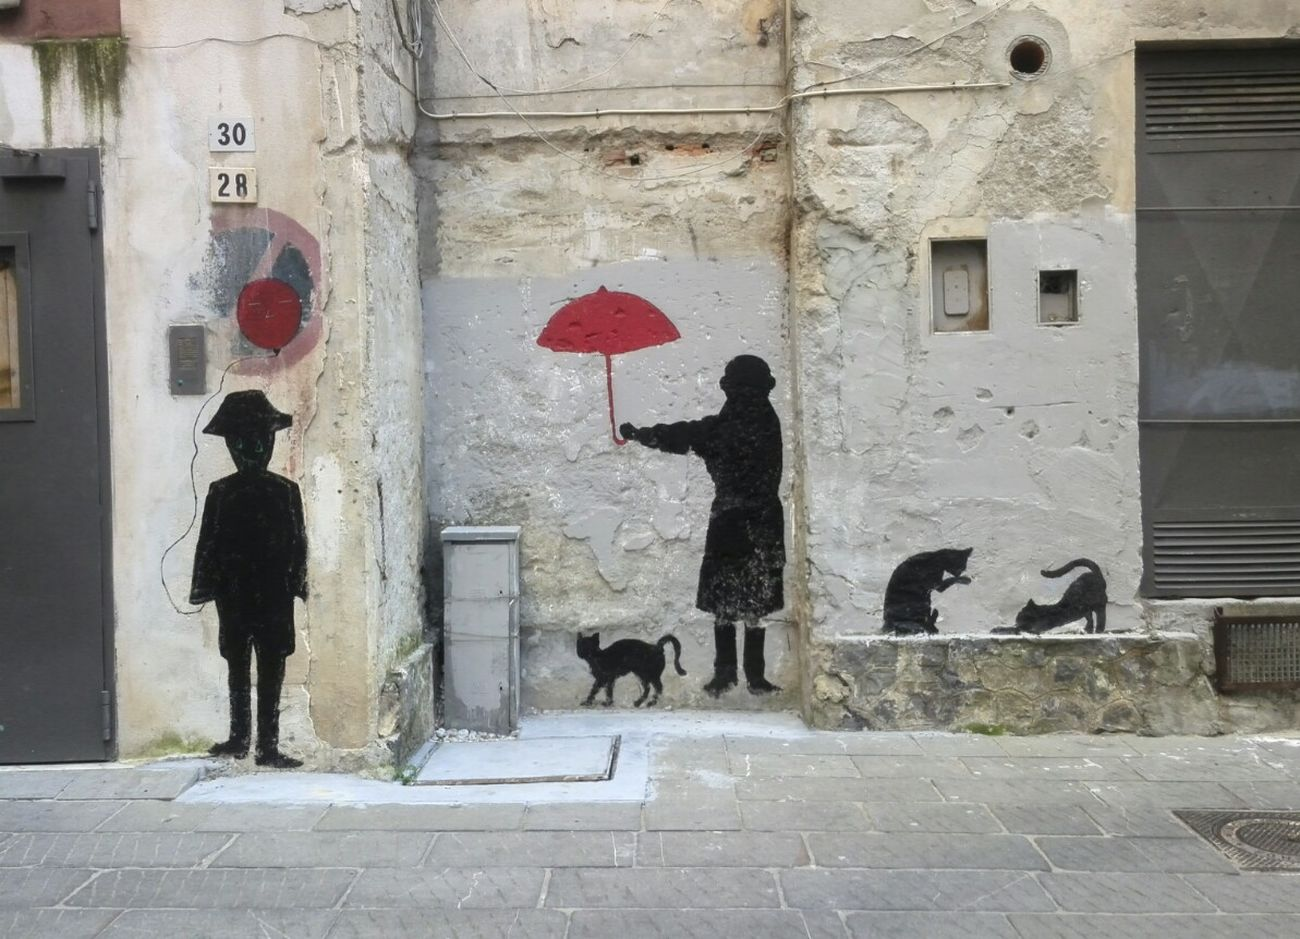 Streetart Streetphotography Graffiti Art Fotoavilo Avilo Robertooliva Eyem Albenga